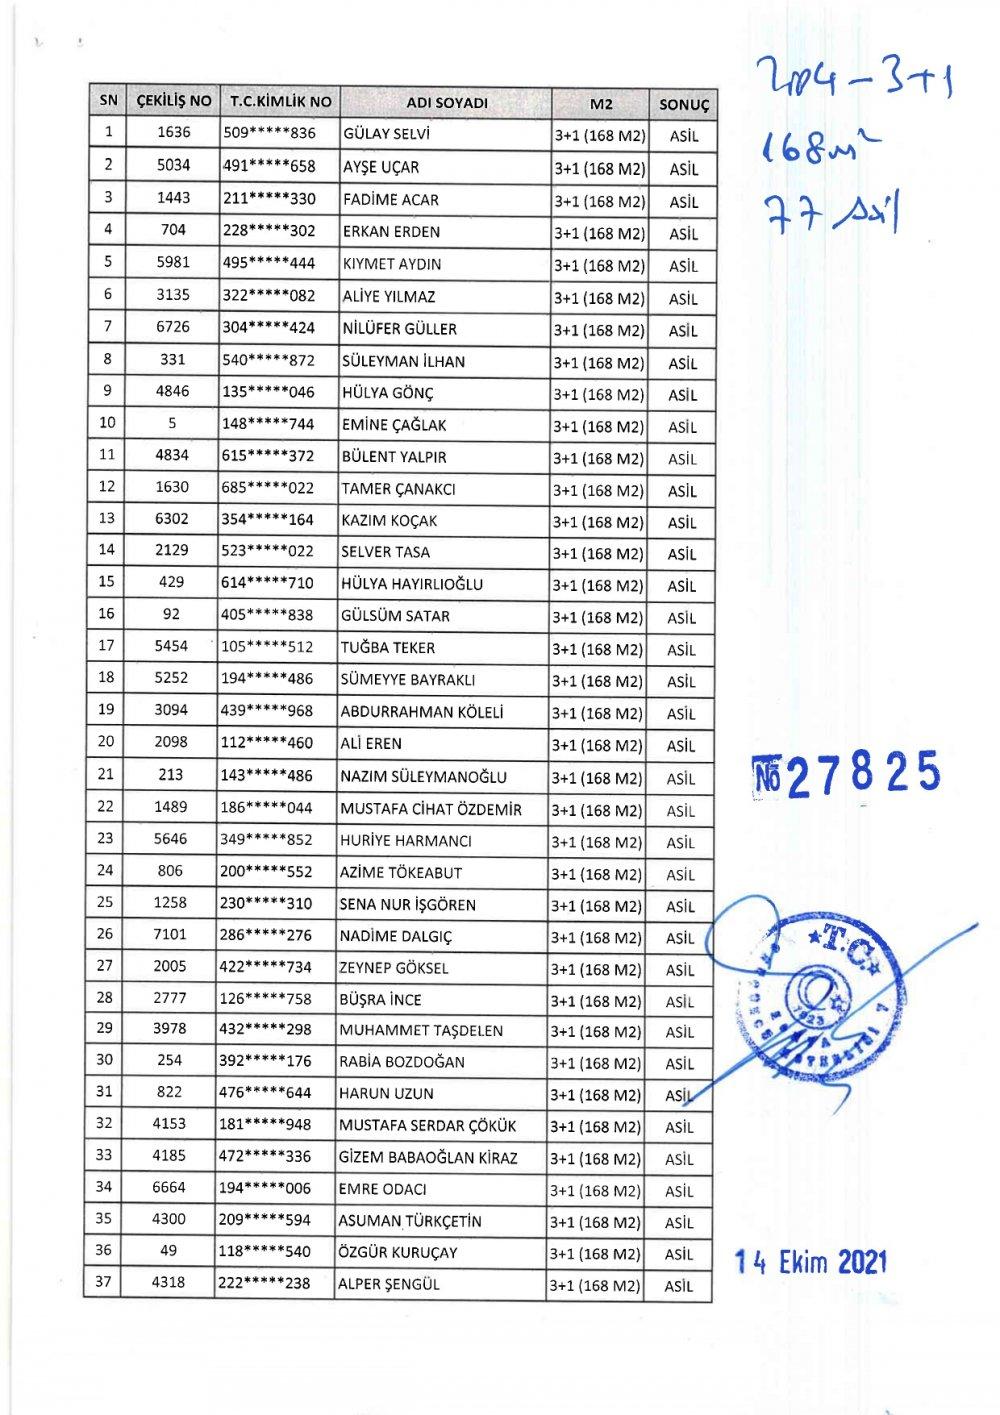 ss-turgutreis-evleri-kyk-kura-cekilis-listesi-page-0012.jpg